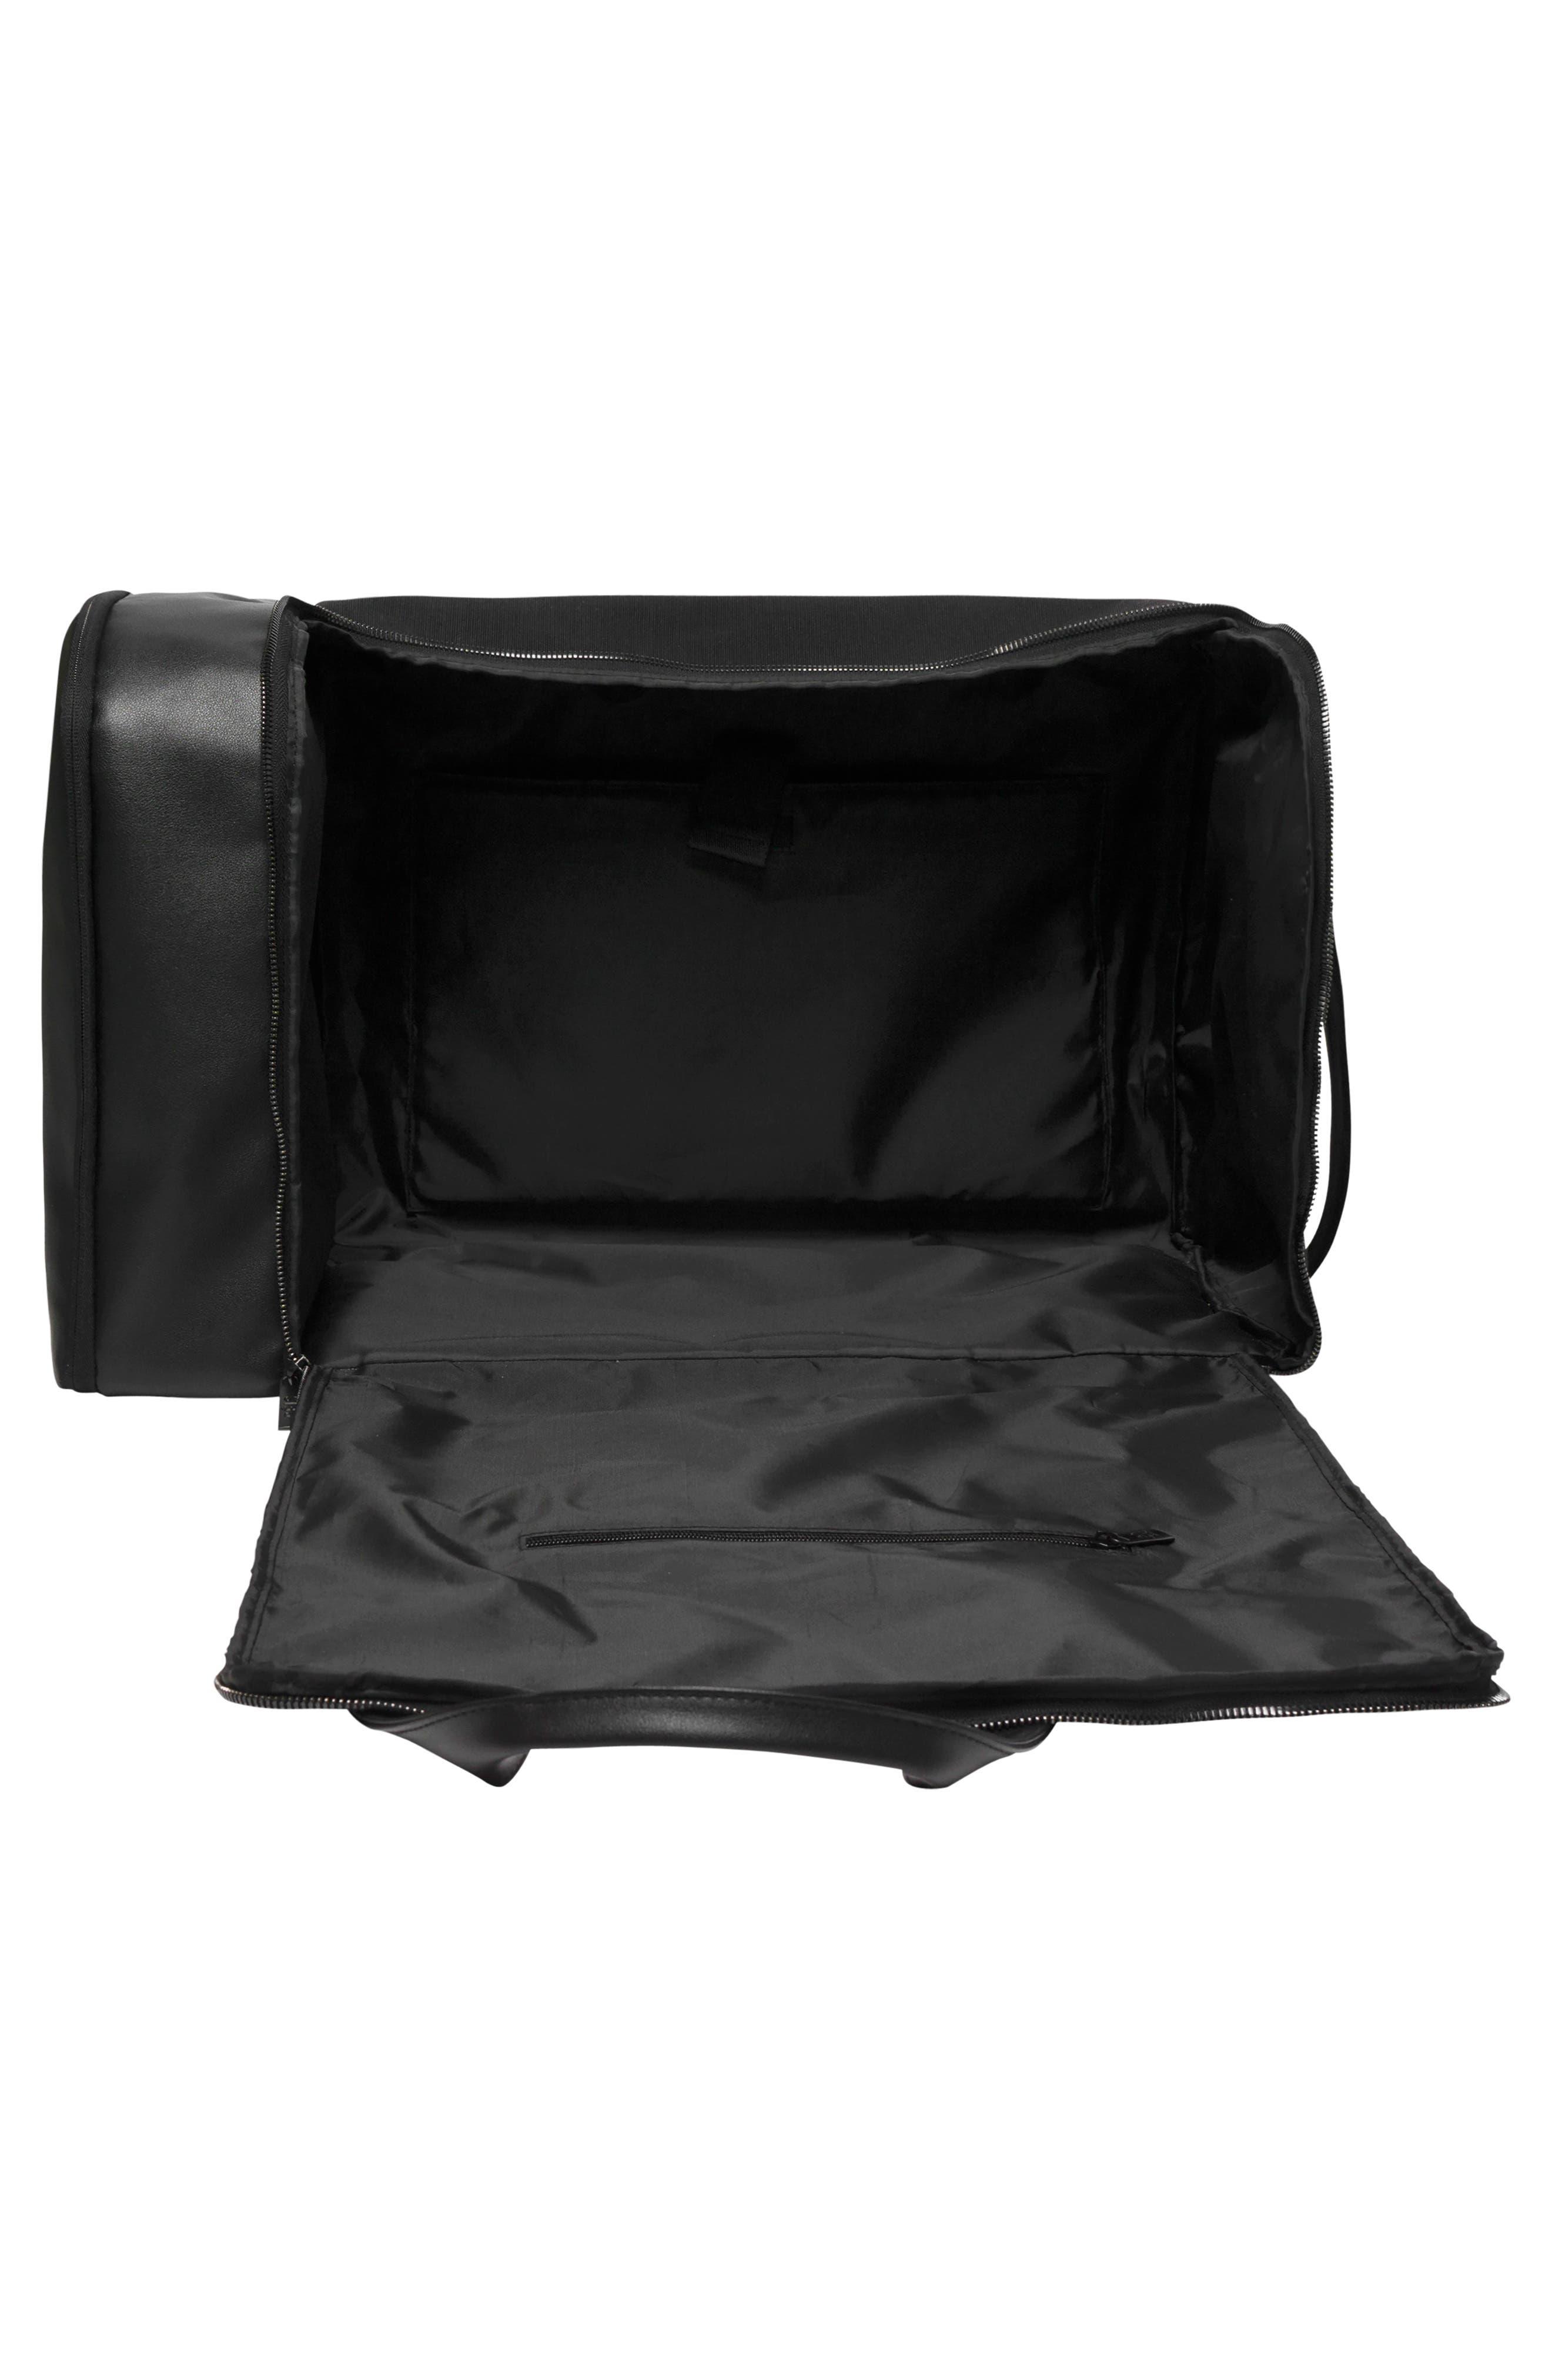 BÉIS, Travel Multi Function Duffle Bag, Alternate thumbnail 7, color, BLACK